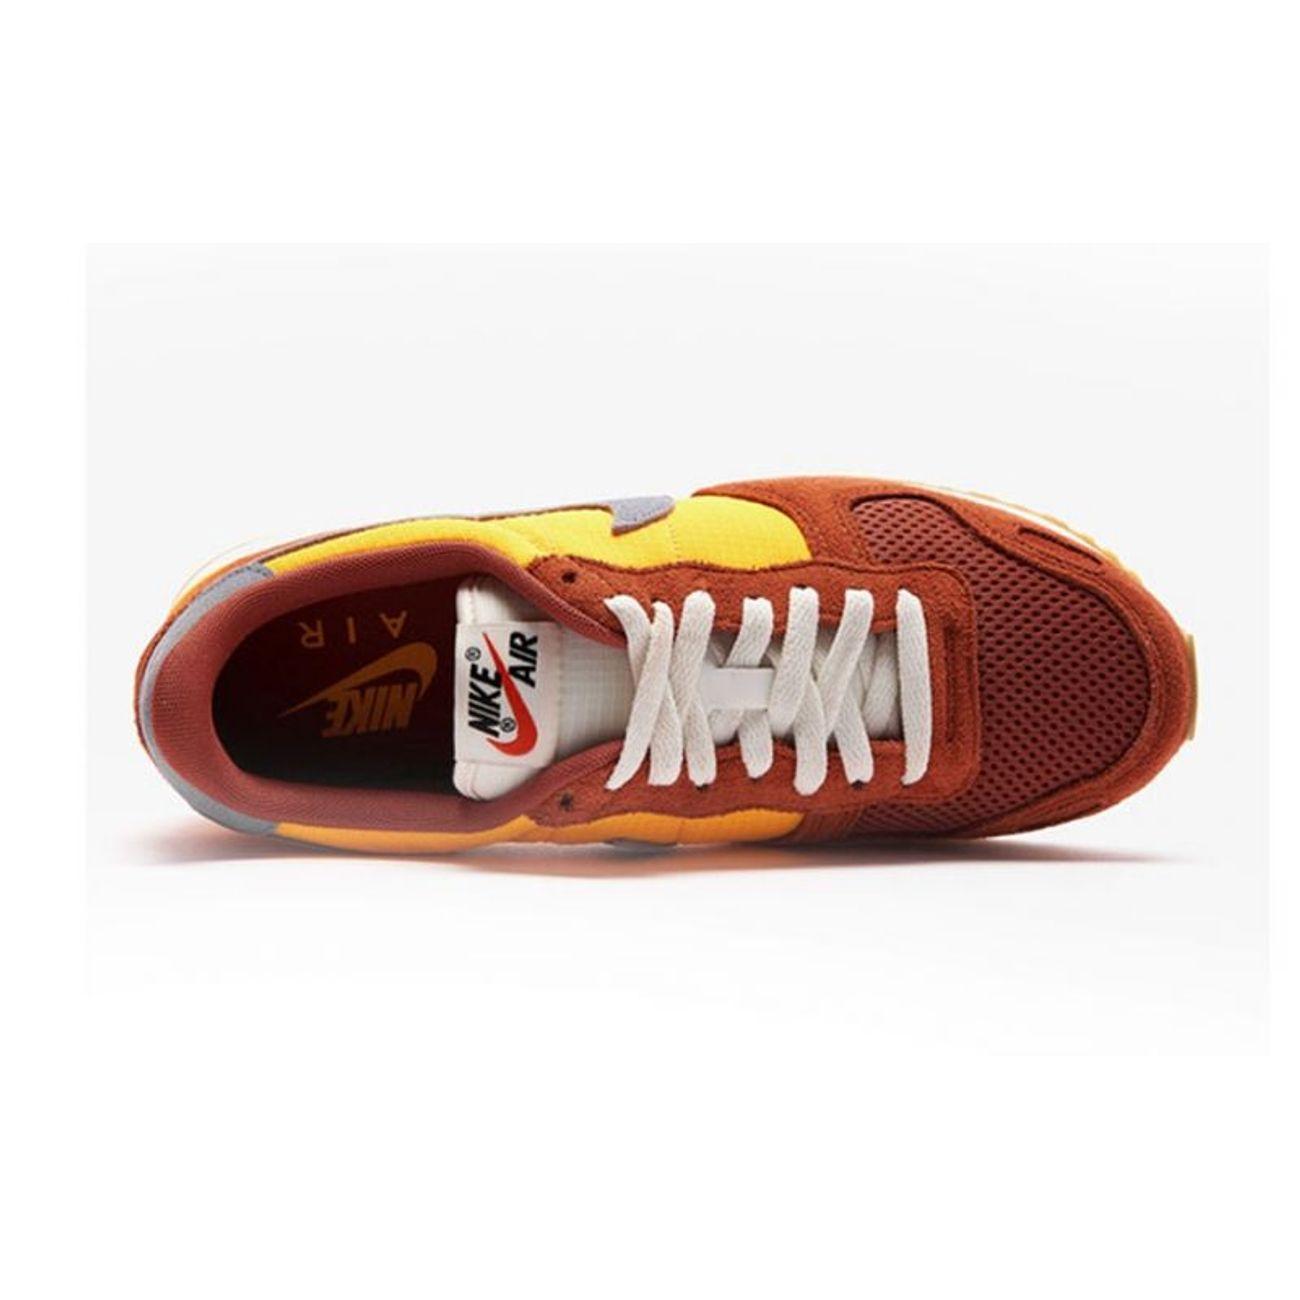 Nike Padel Air Obscure Vrtx Pêche 201 Adulte Ni903896 sdQrxthC